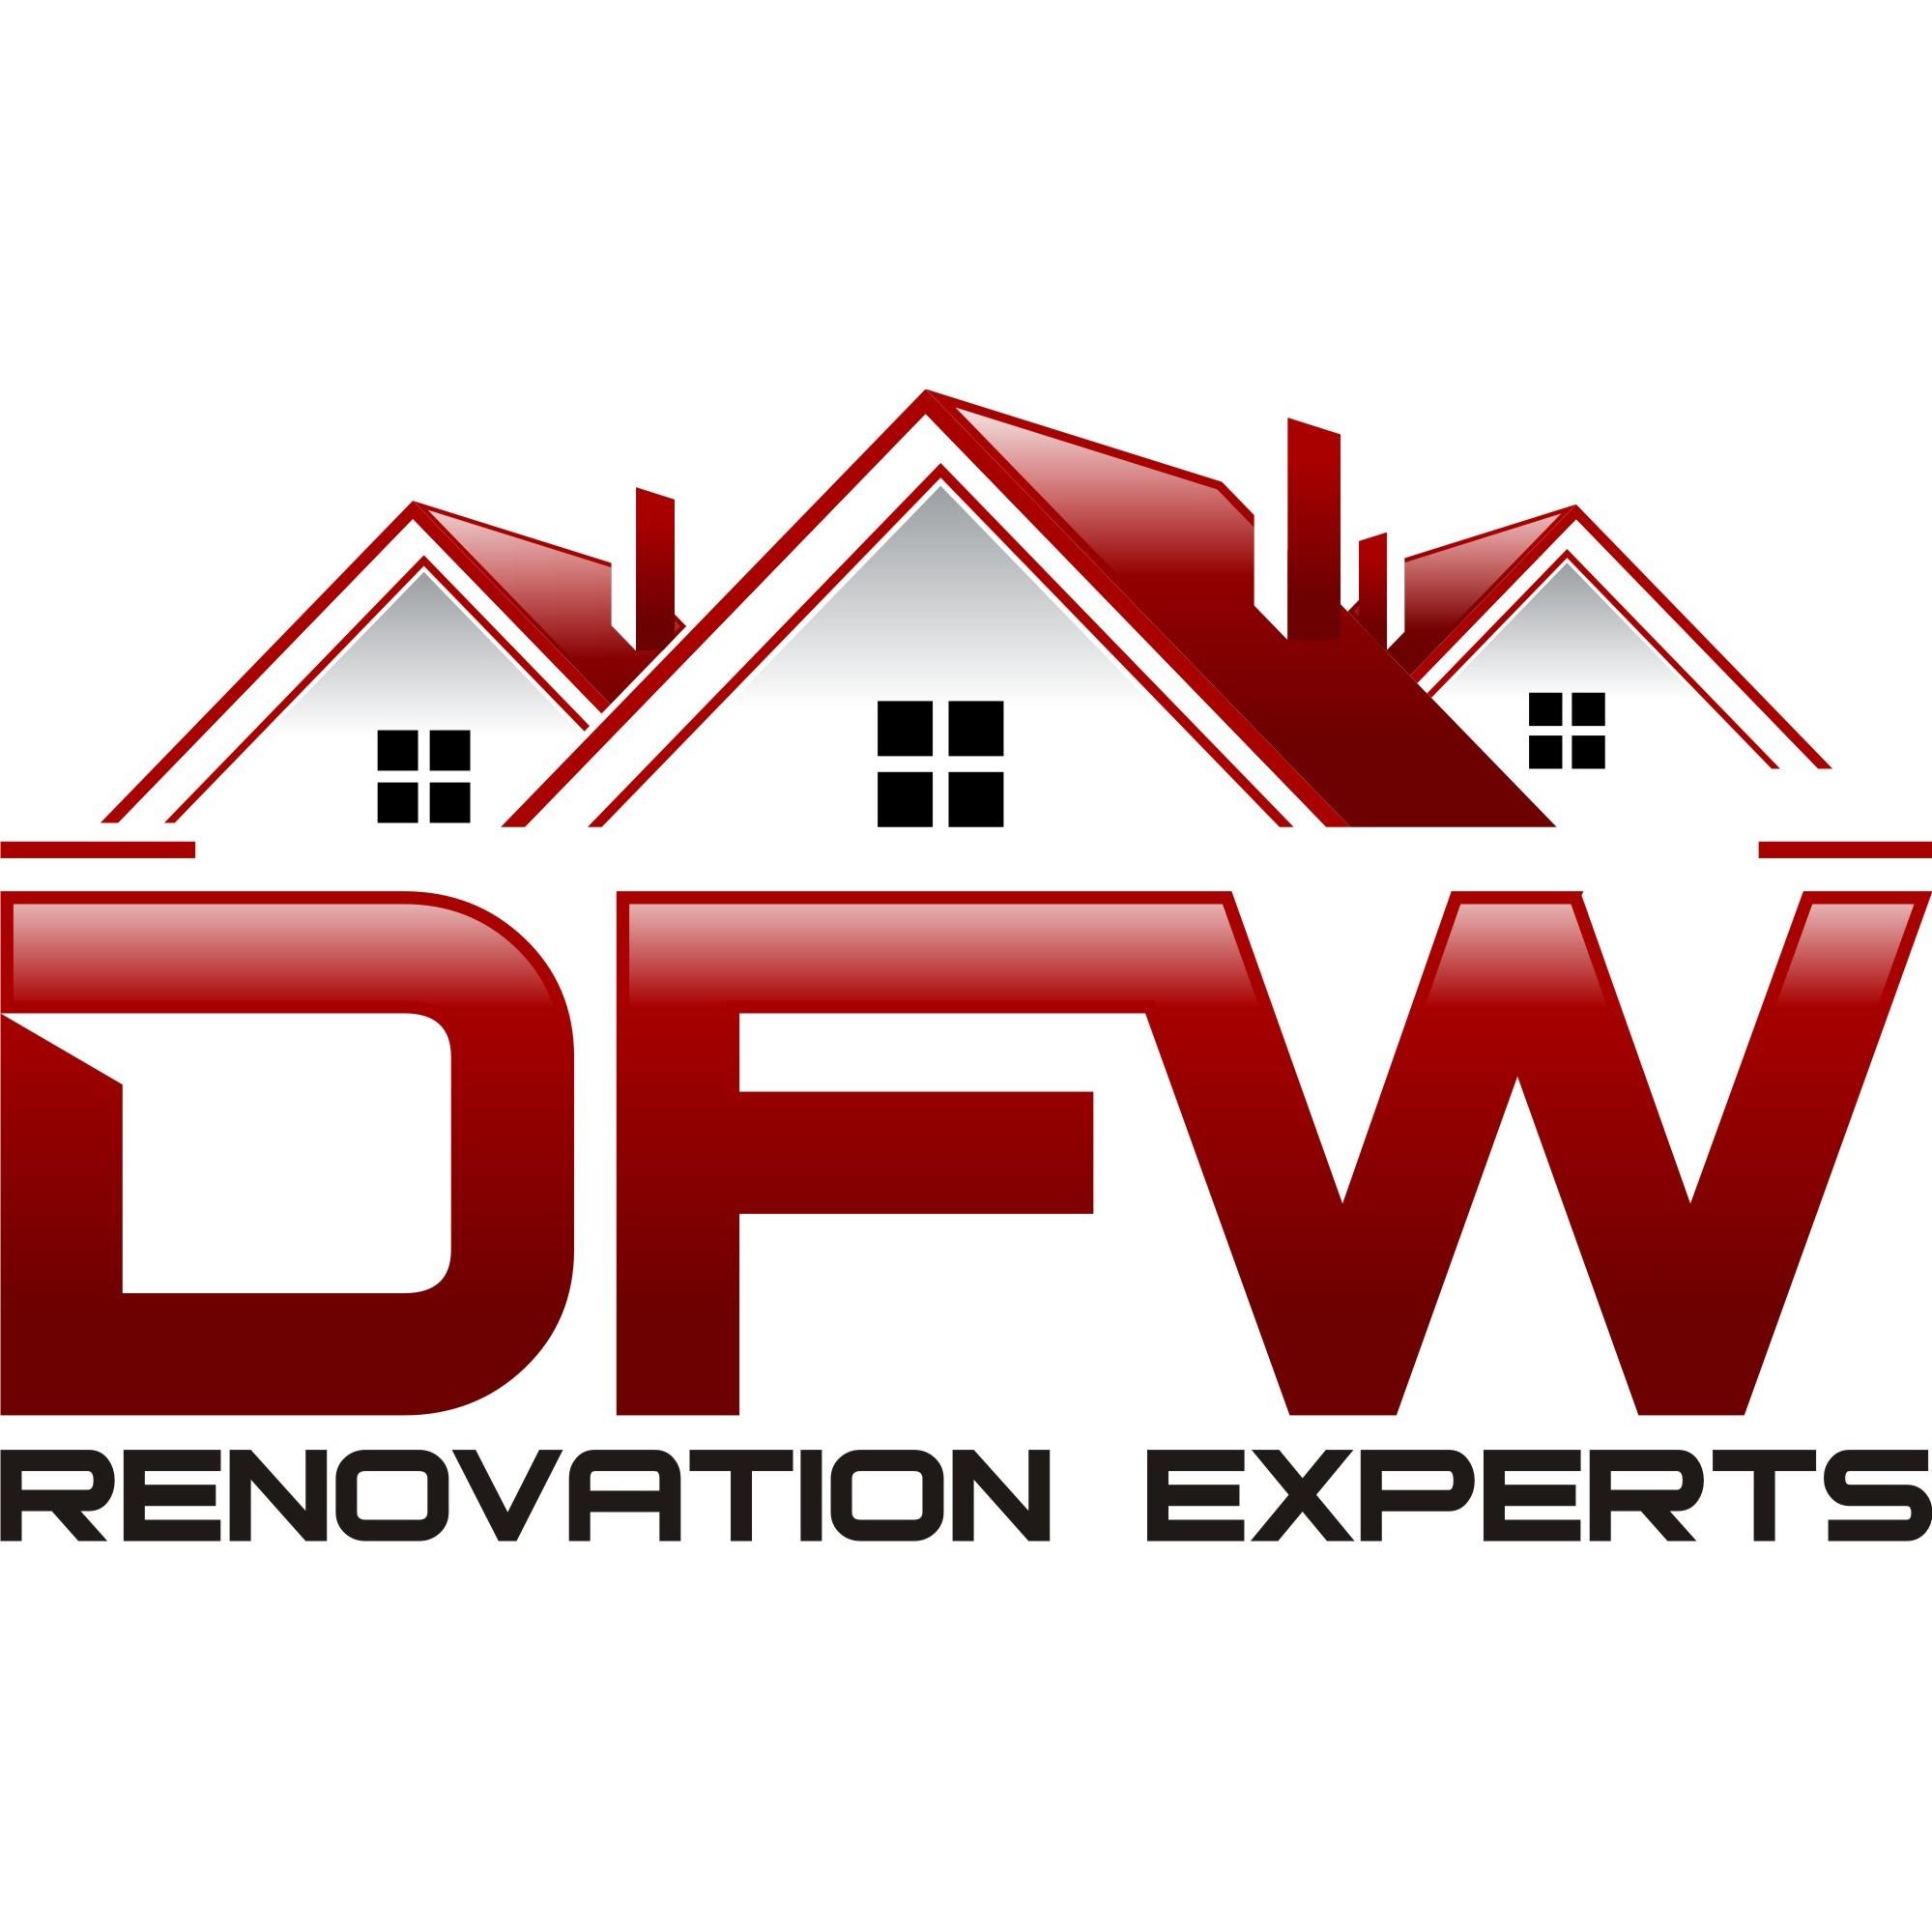 DFW Renovation Experts